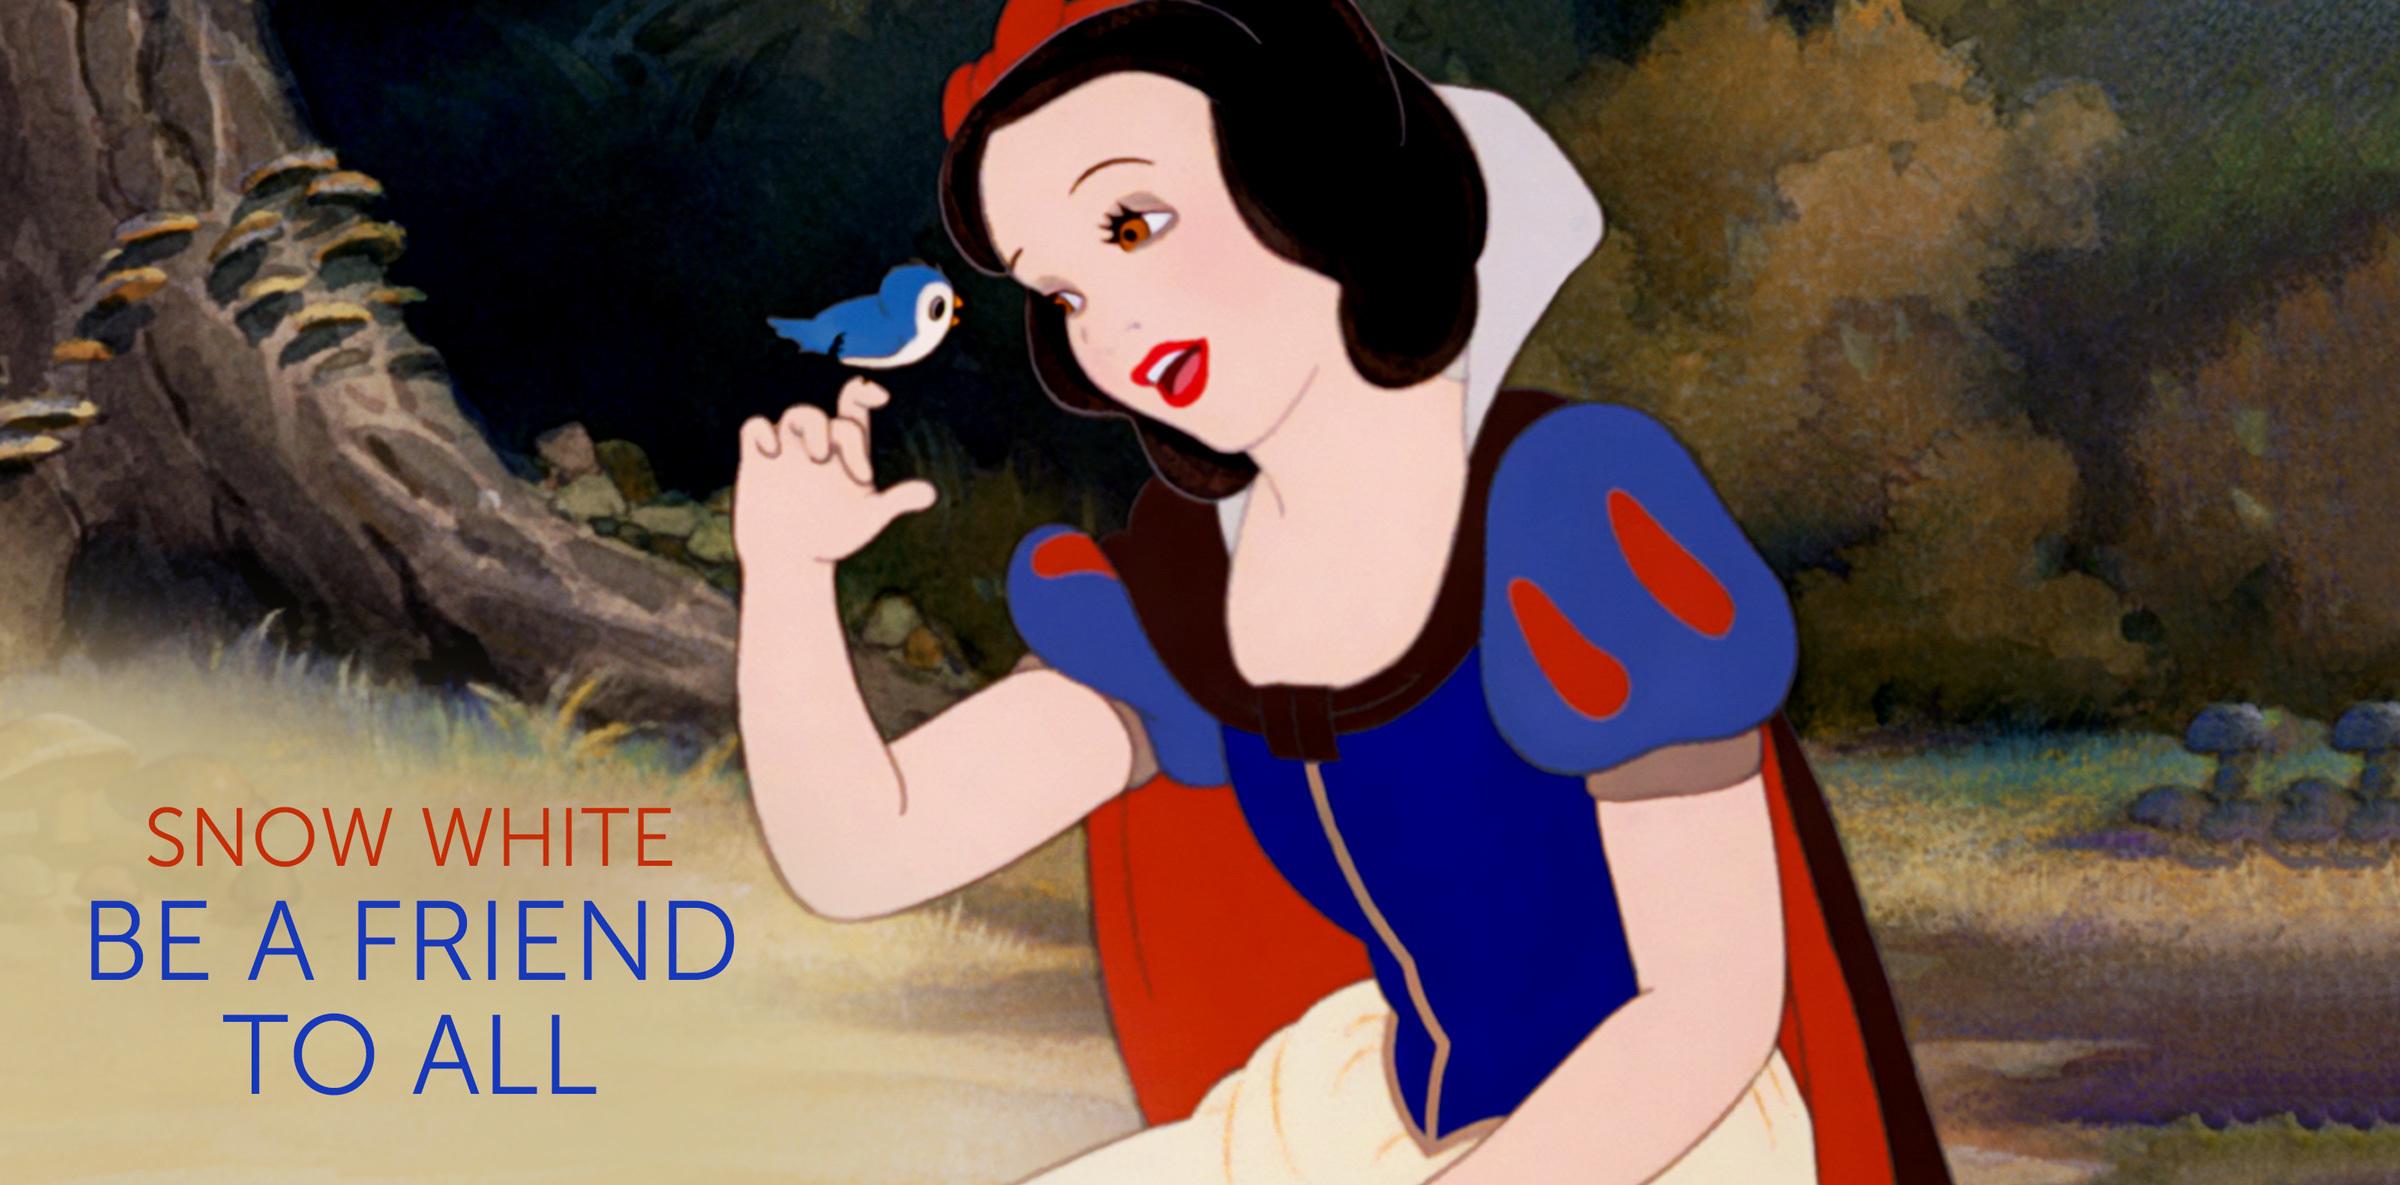 Snow White MOVIE ART 1